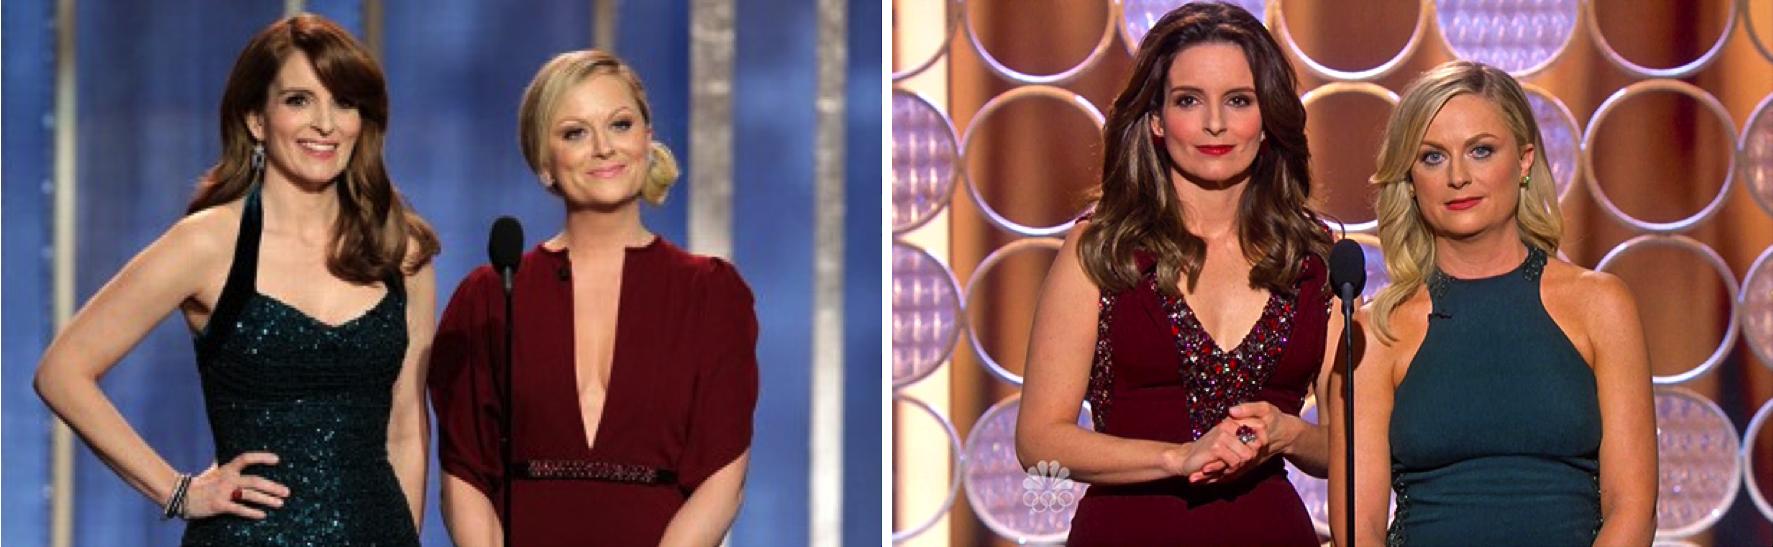 TinaFeyandAmyPoehler - Golden Globes 2013 & 2014